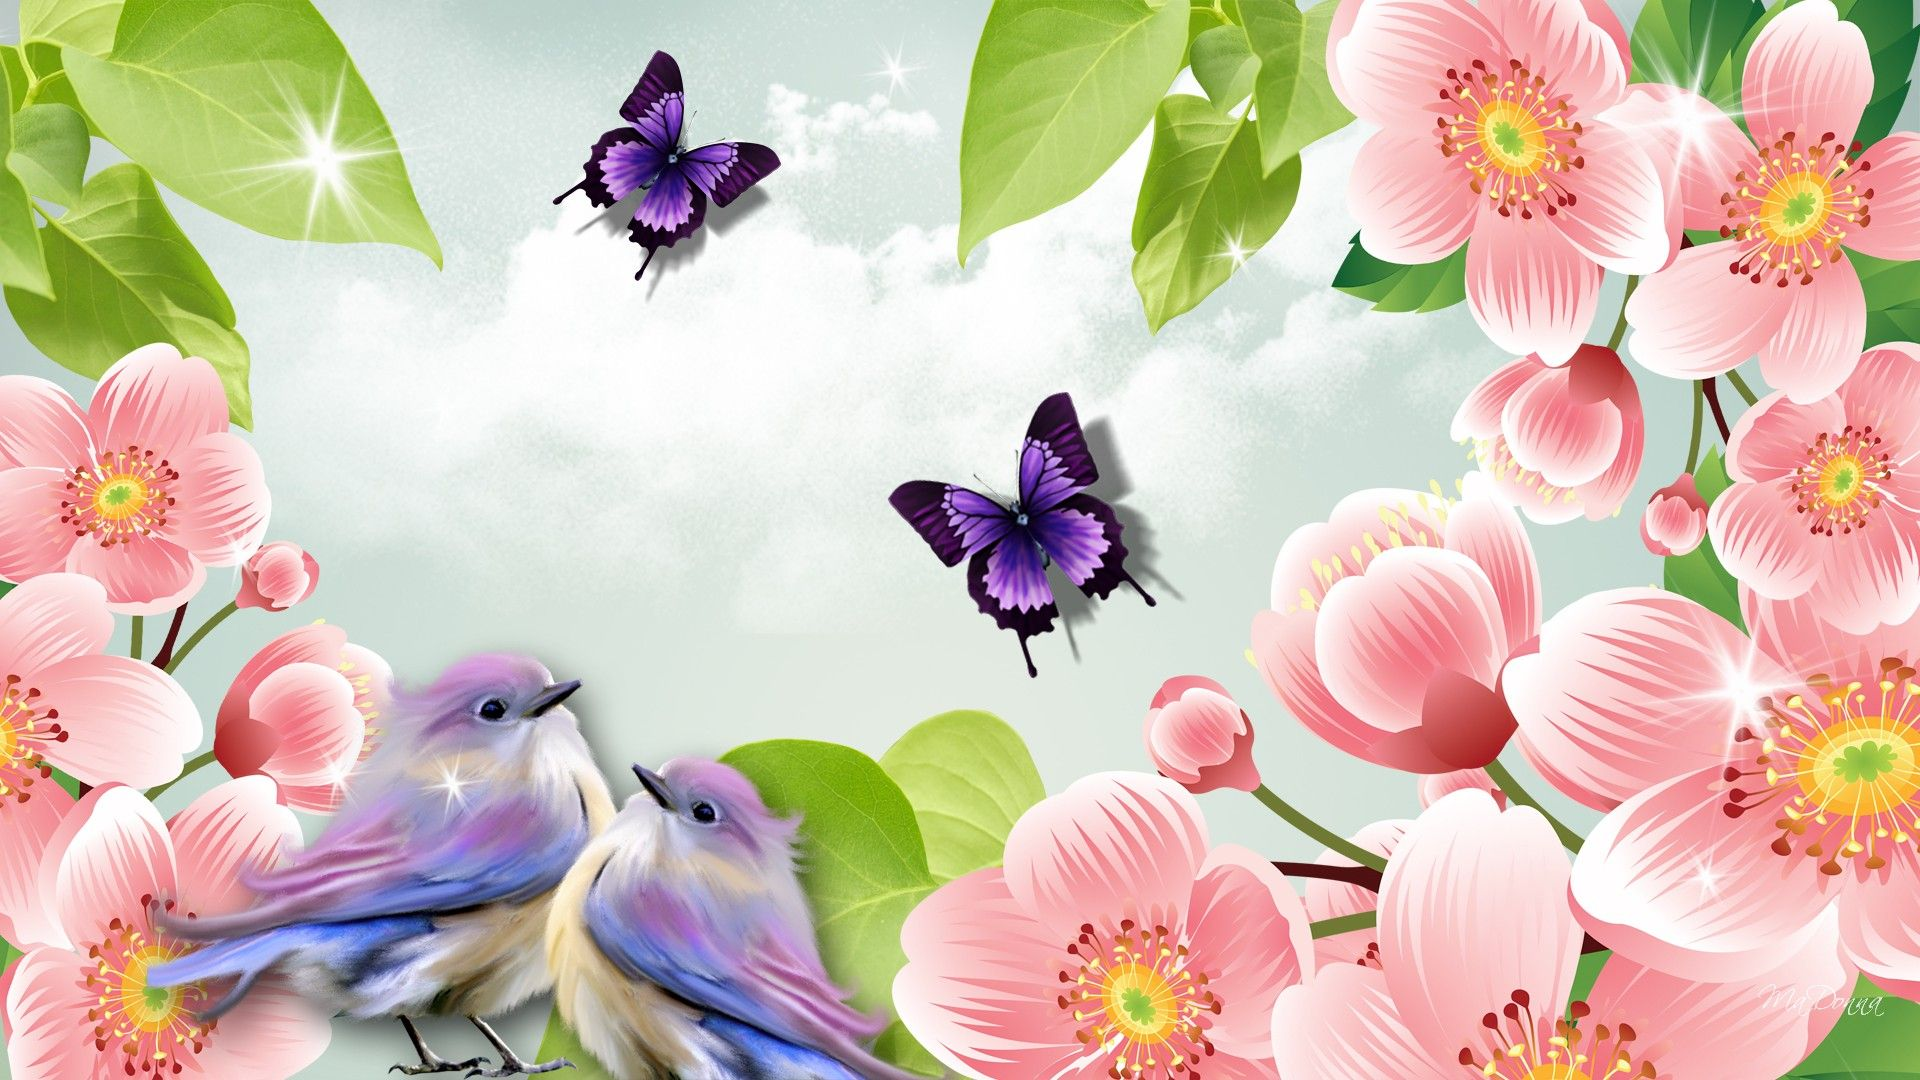 Hd wallpaper spring - Images For Cute Spring Desktop Wallpaper